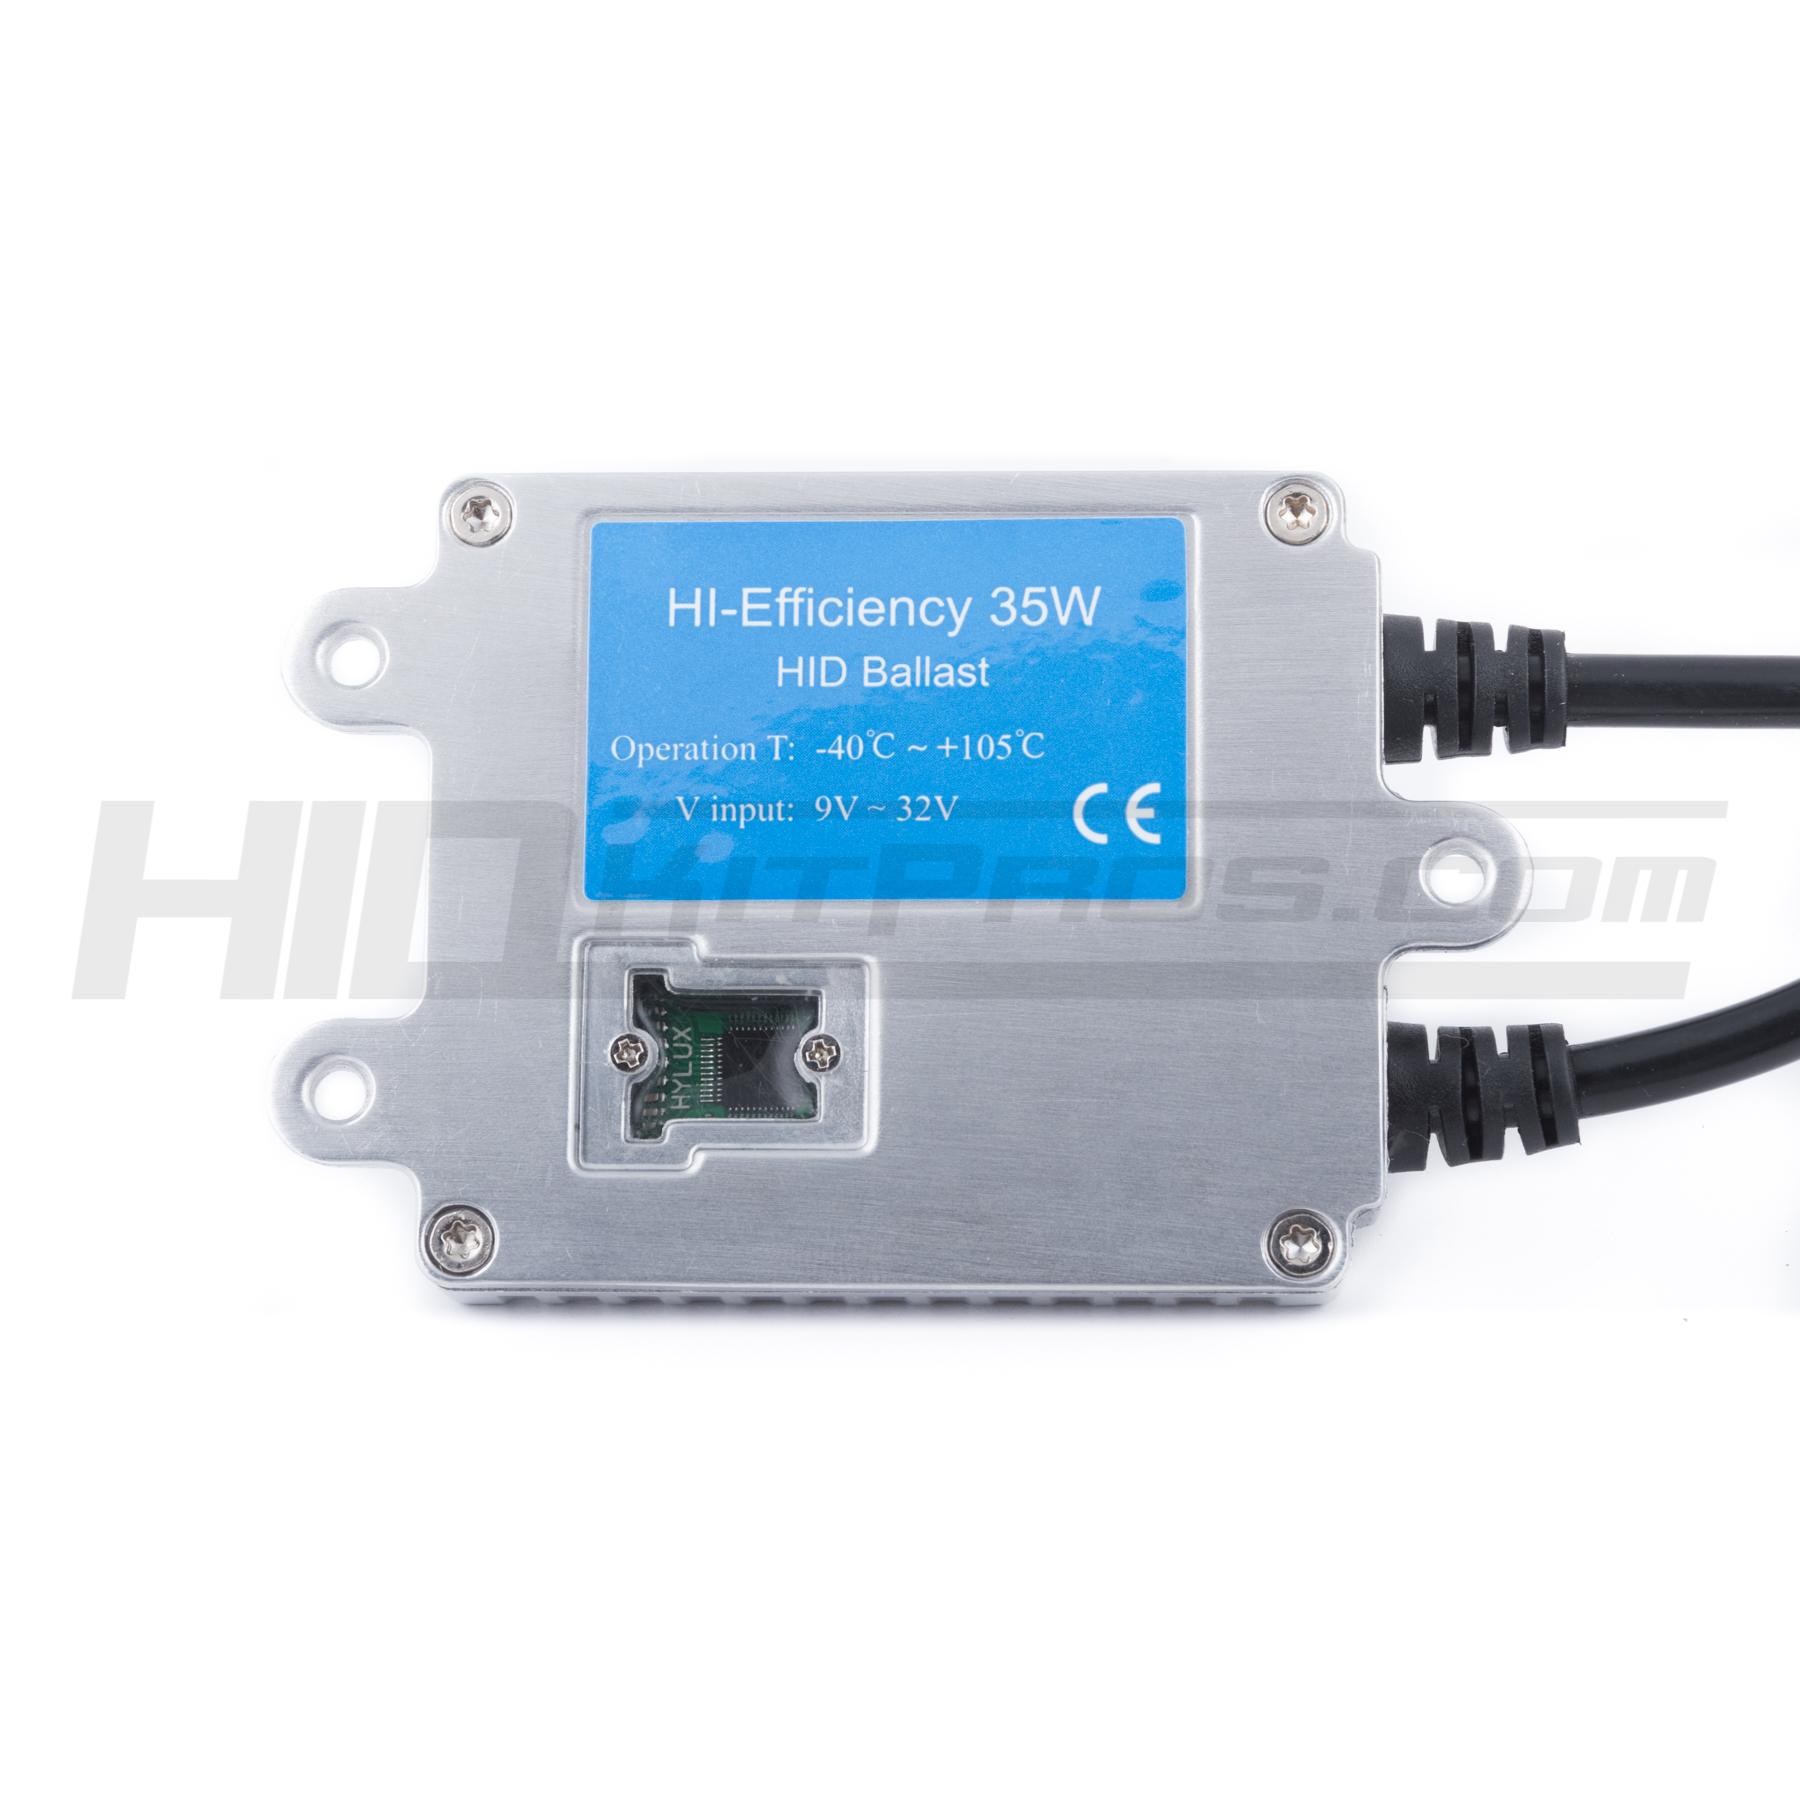 Energy savings ballast cross reference - Hylux Authentic Hi Efficency 35w Hid Ballast